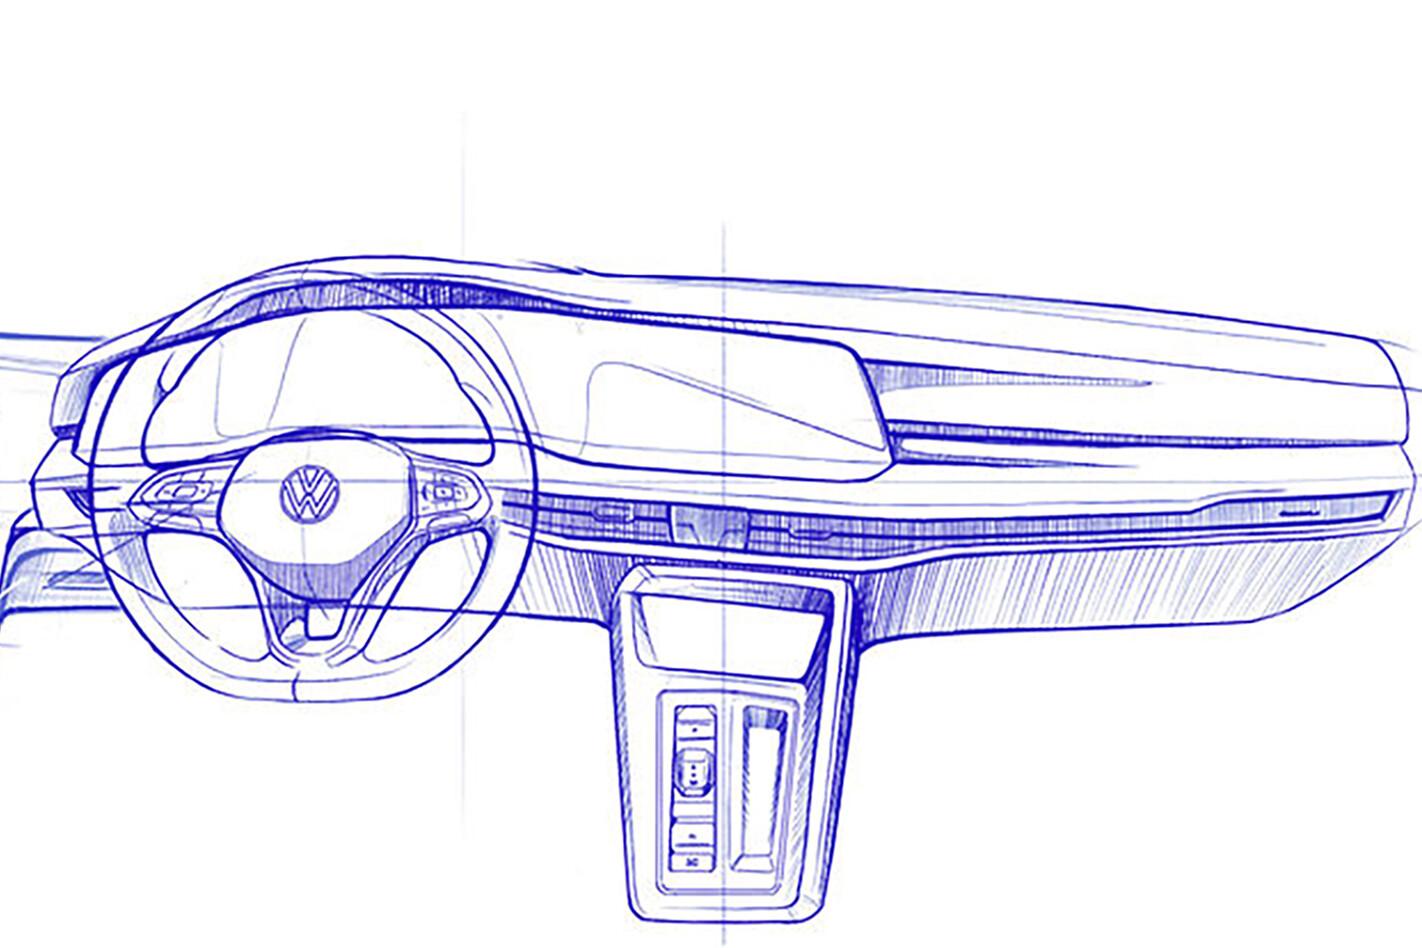 New VW Golf MK8 dash sketches